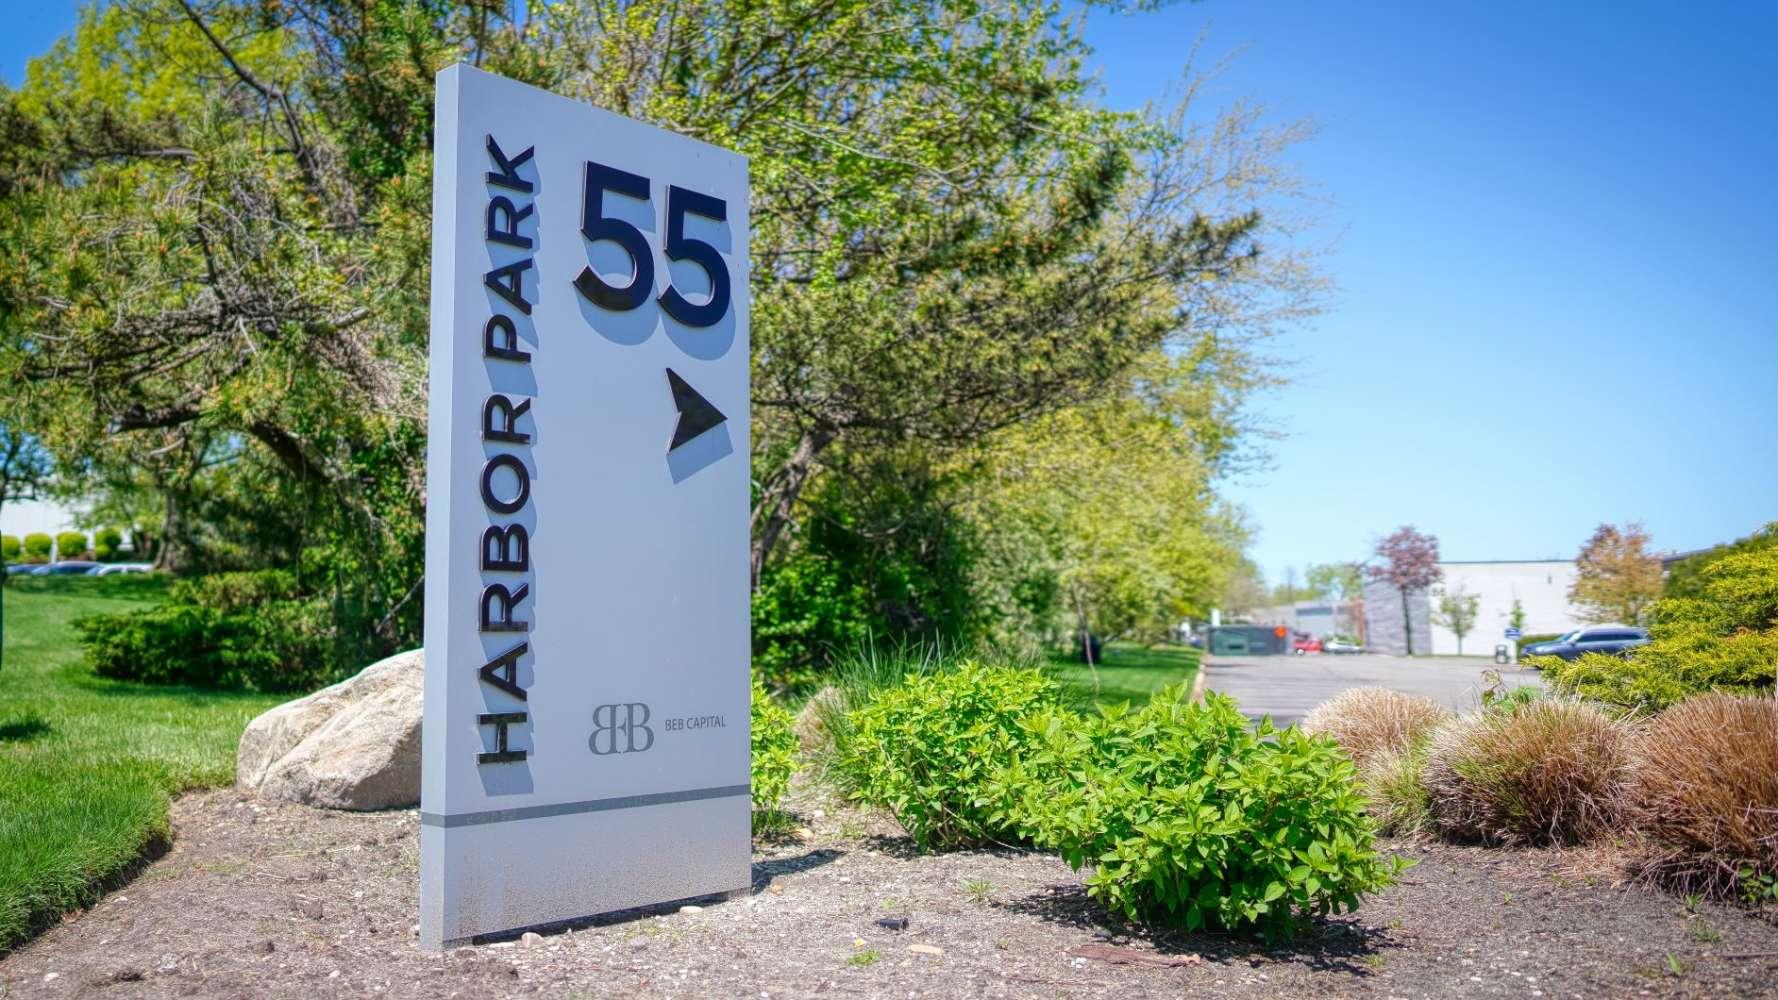 Industrial Port washington, 11050 - 55 Harbor Park Dr